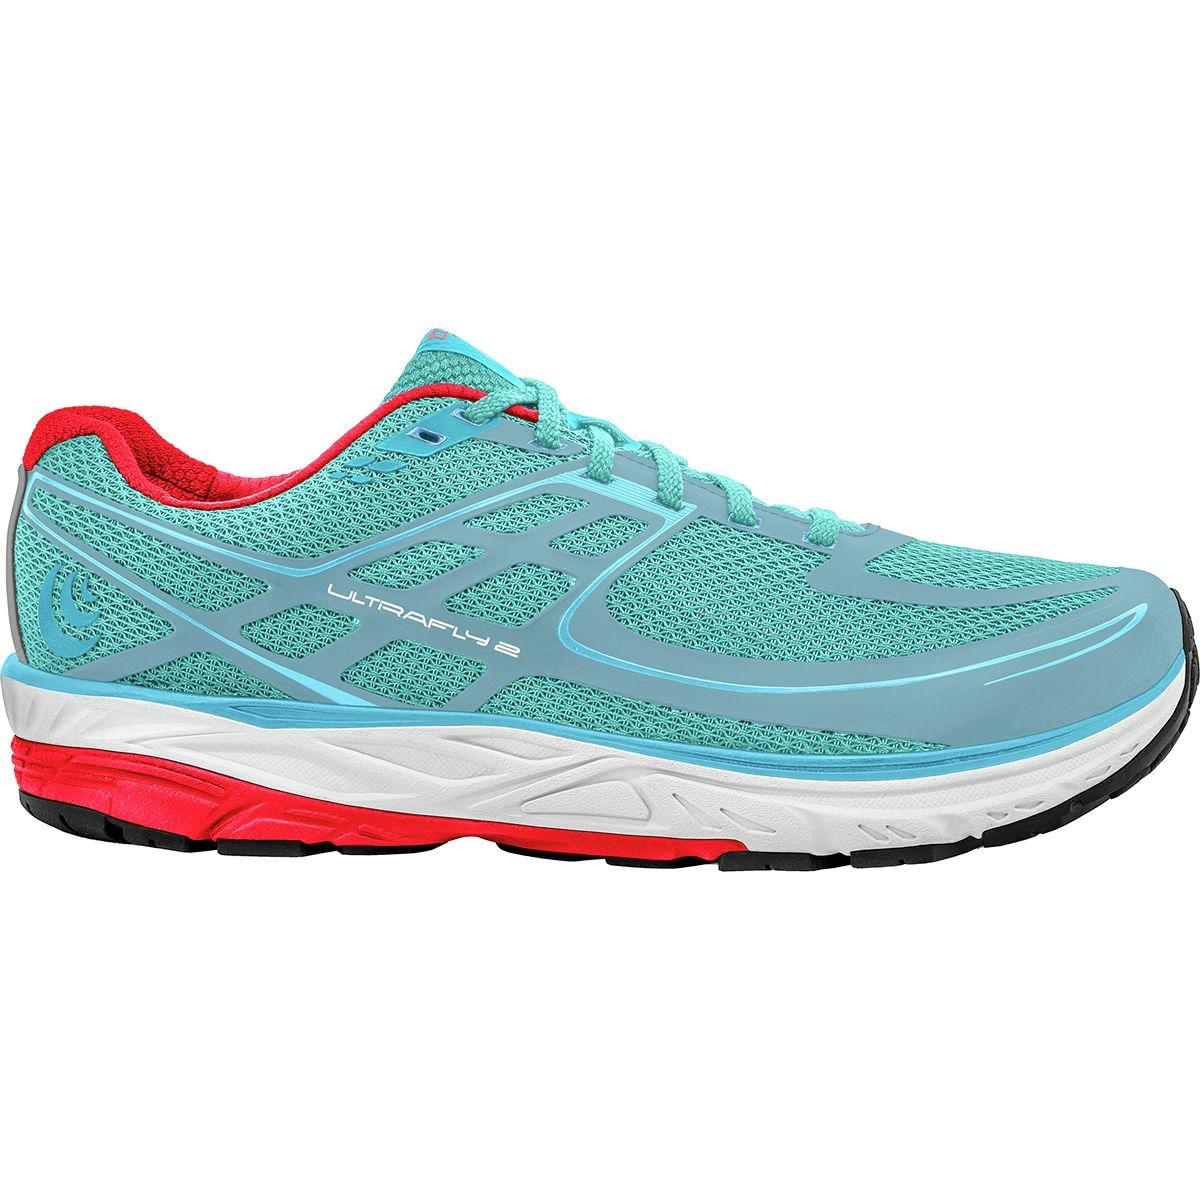 Topo Athletic Women/'s Ultrafly 2 Running Shoe Size 7 US 38 EU Black // Blue